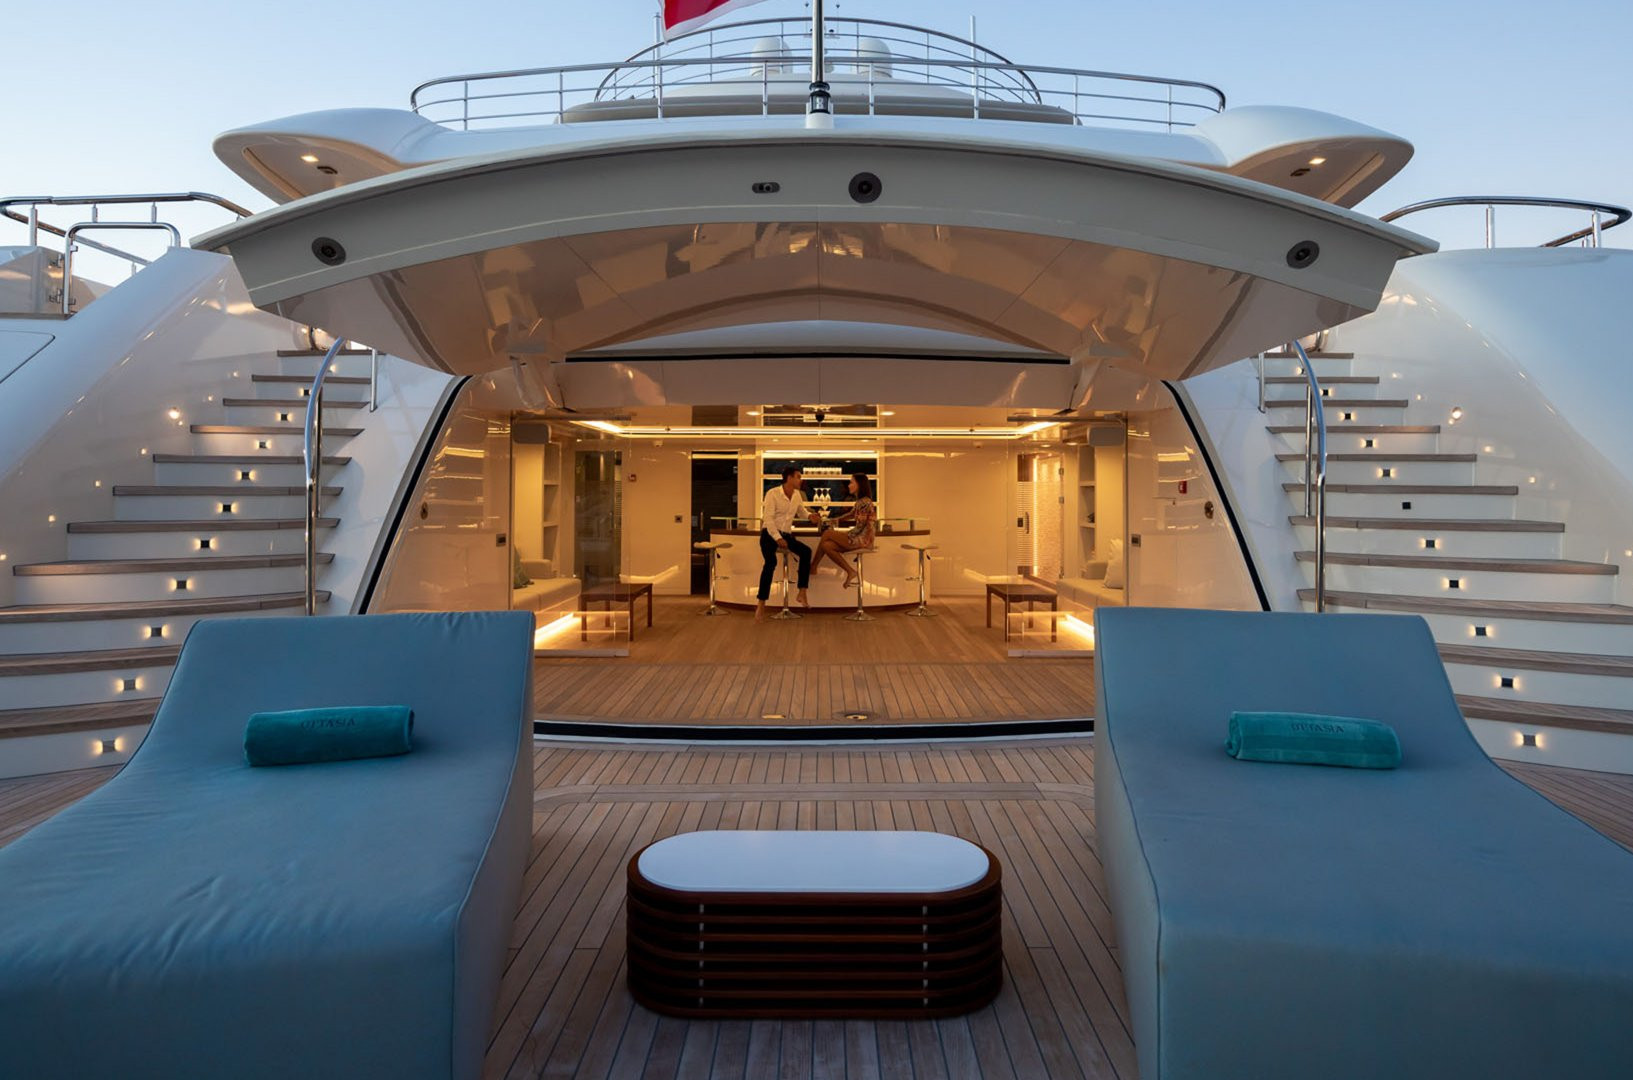 Mega yacht beach club in the evening